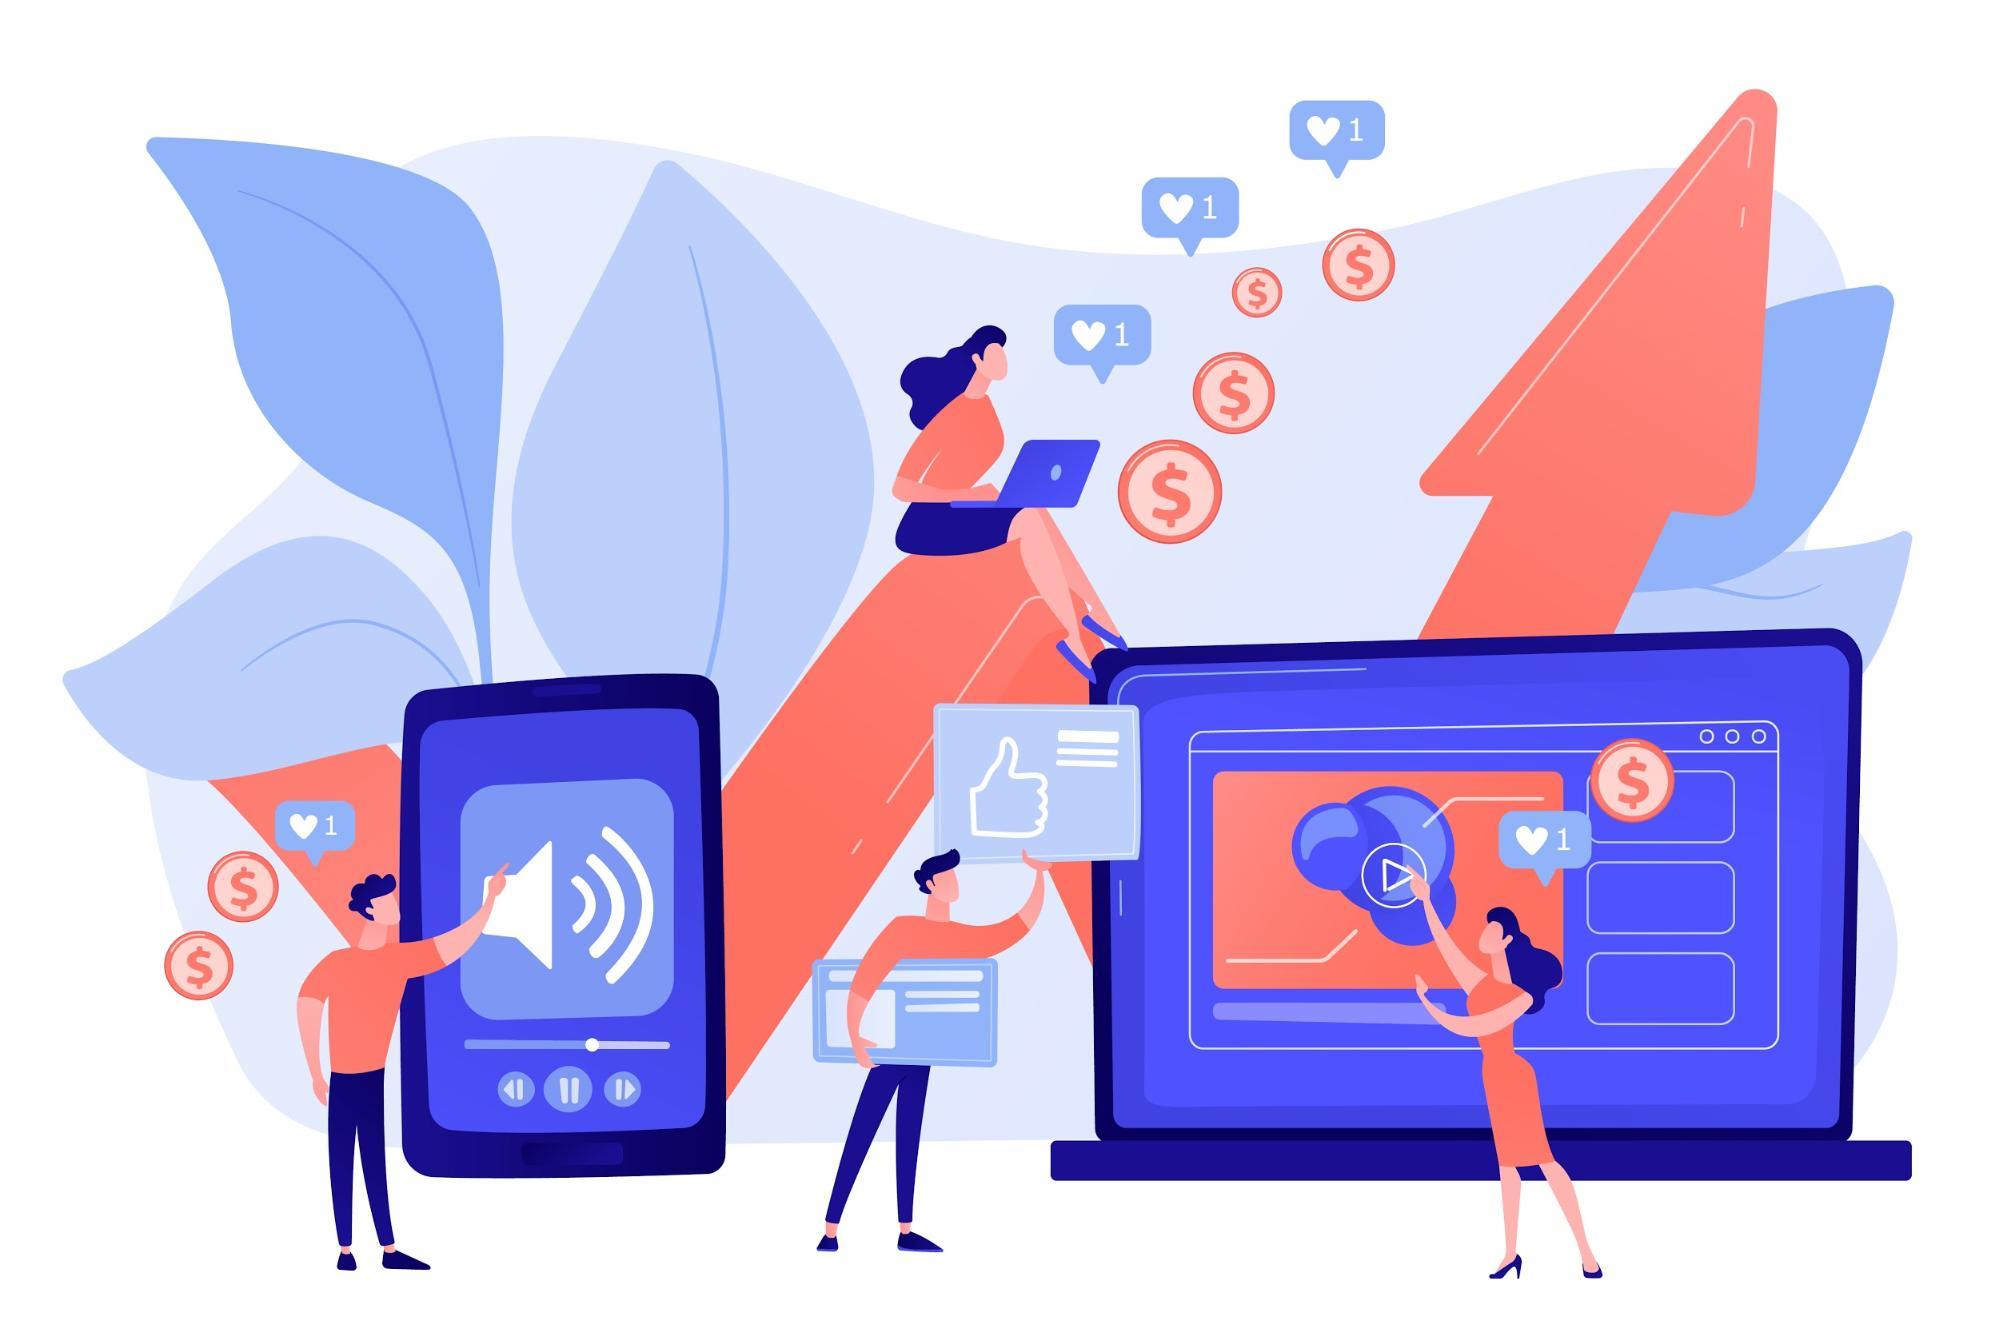 A little more for 2021 - Instagram Influencer marketing